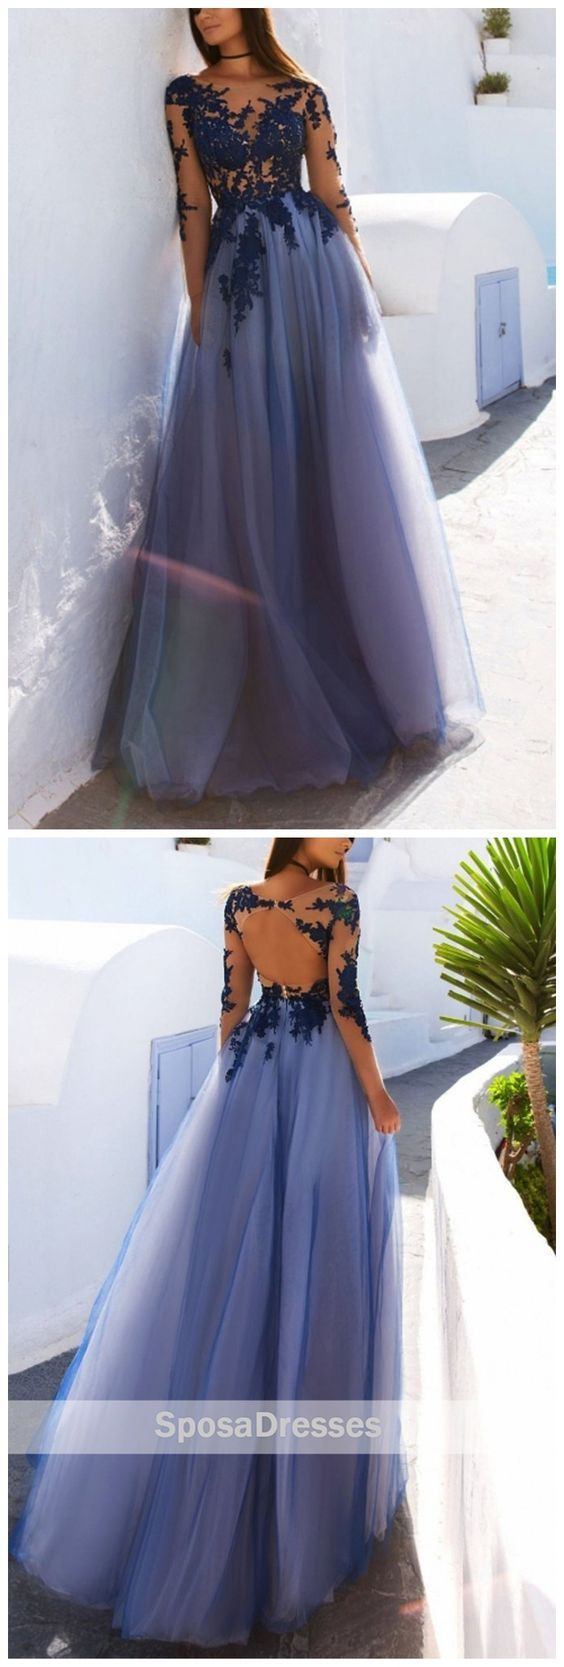 Pin Op Dresses [ 1667 x 564 Pixel ]